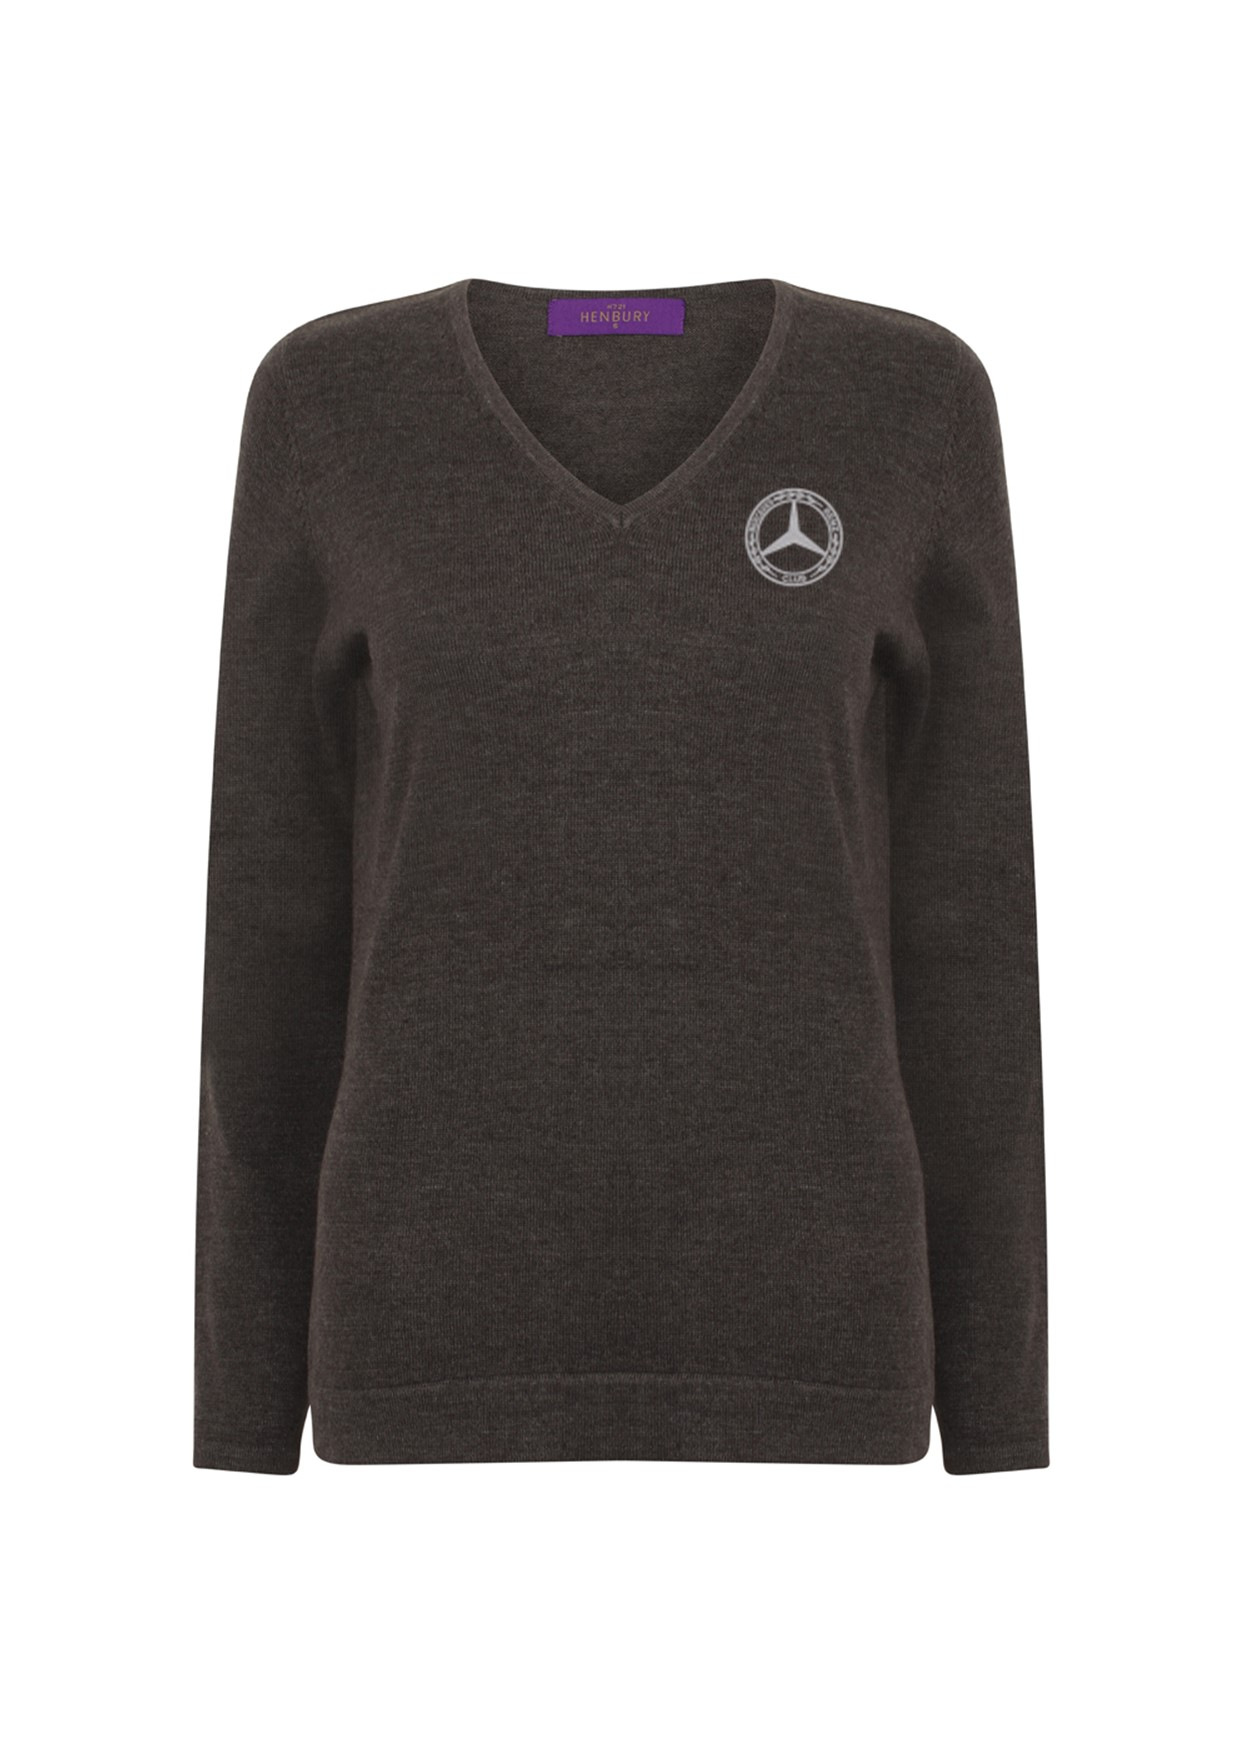 Mercedes-Benz Club Ladies Lightweight Knitted V Neck Sweater Grey Marl